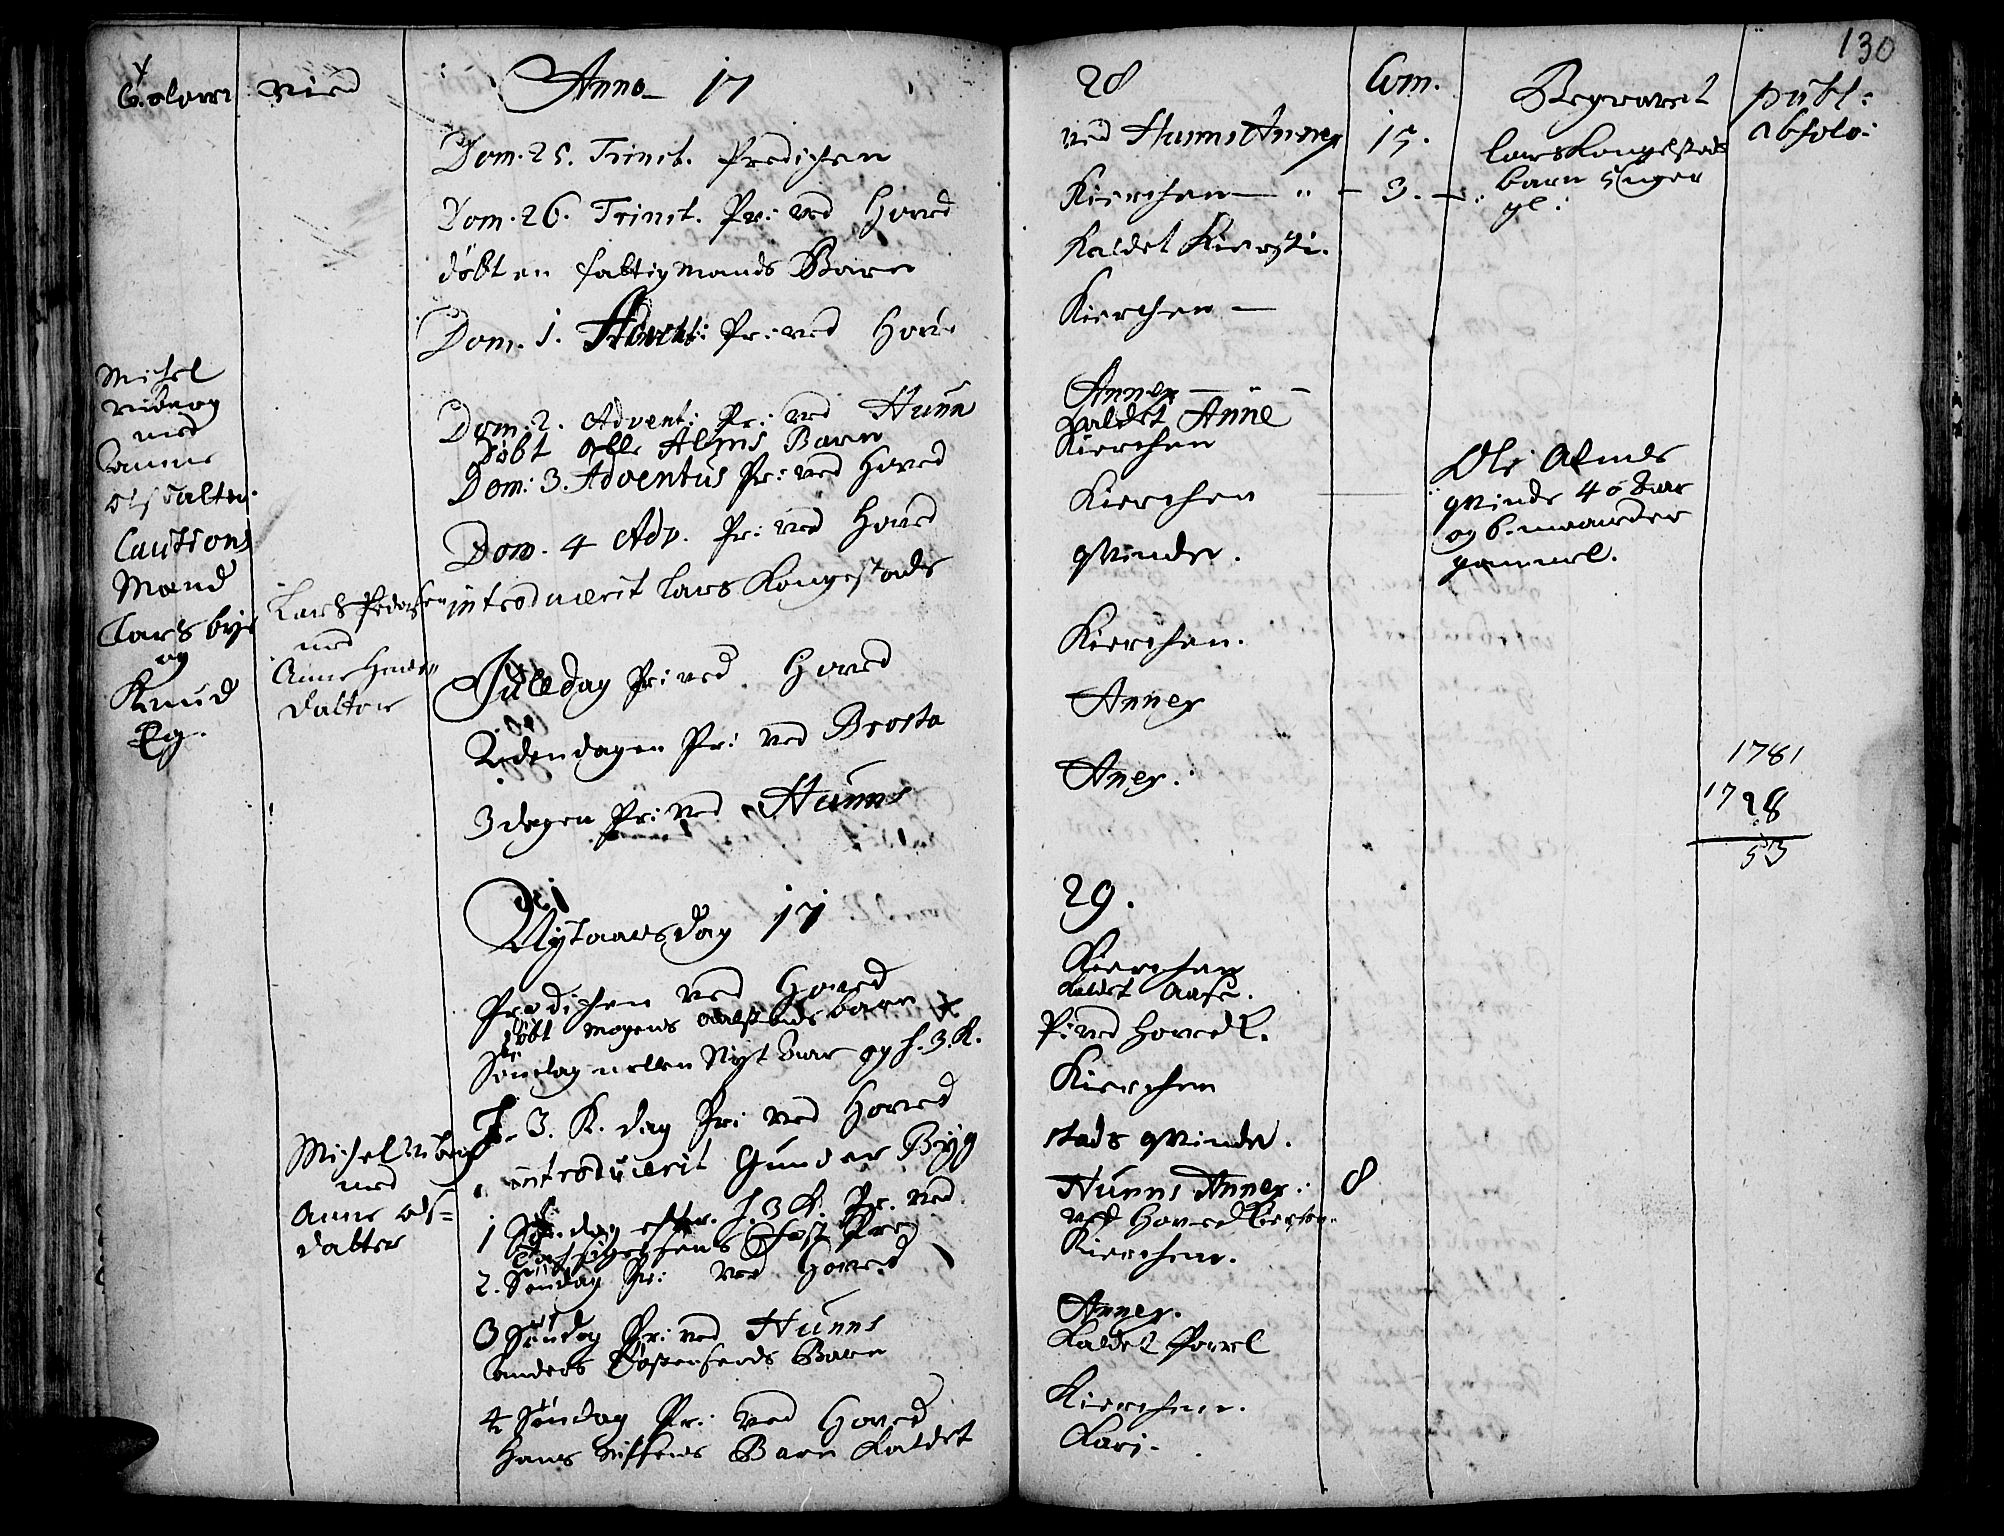 SAH, Vardal prestekontor, H/Ha/Haa/L0001: Ministerialbok nr. 1, 1706-1748, s. 130